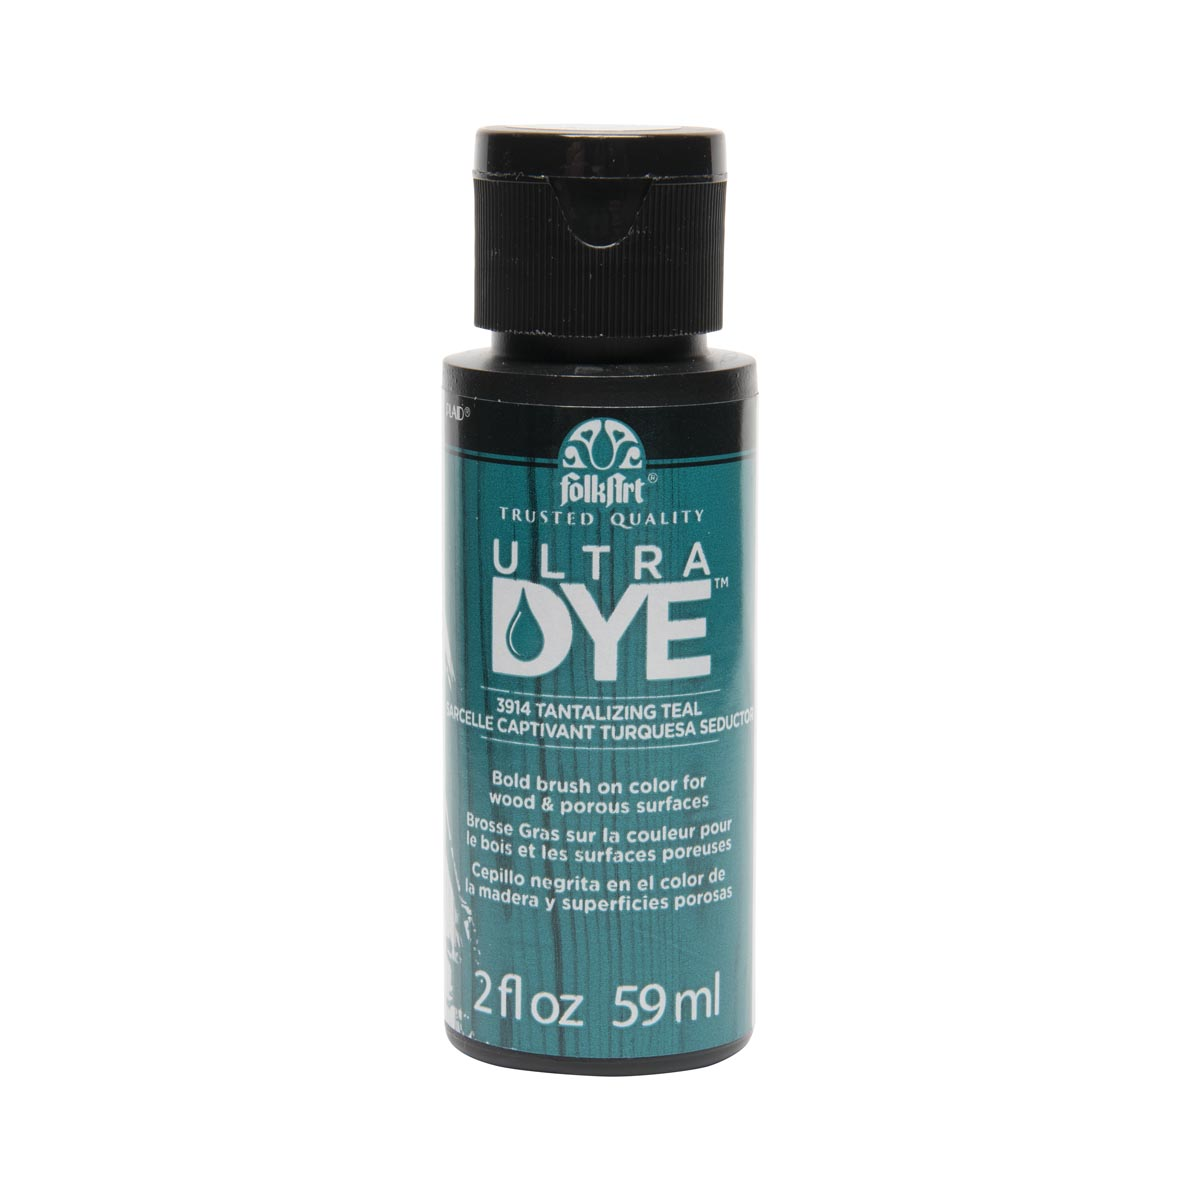 FolkArt ® Ultra Dye™ Colors - Tantalizing Teal, 2 oz.